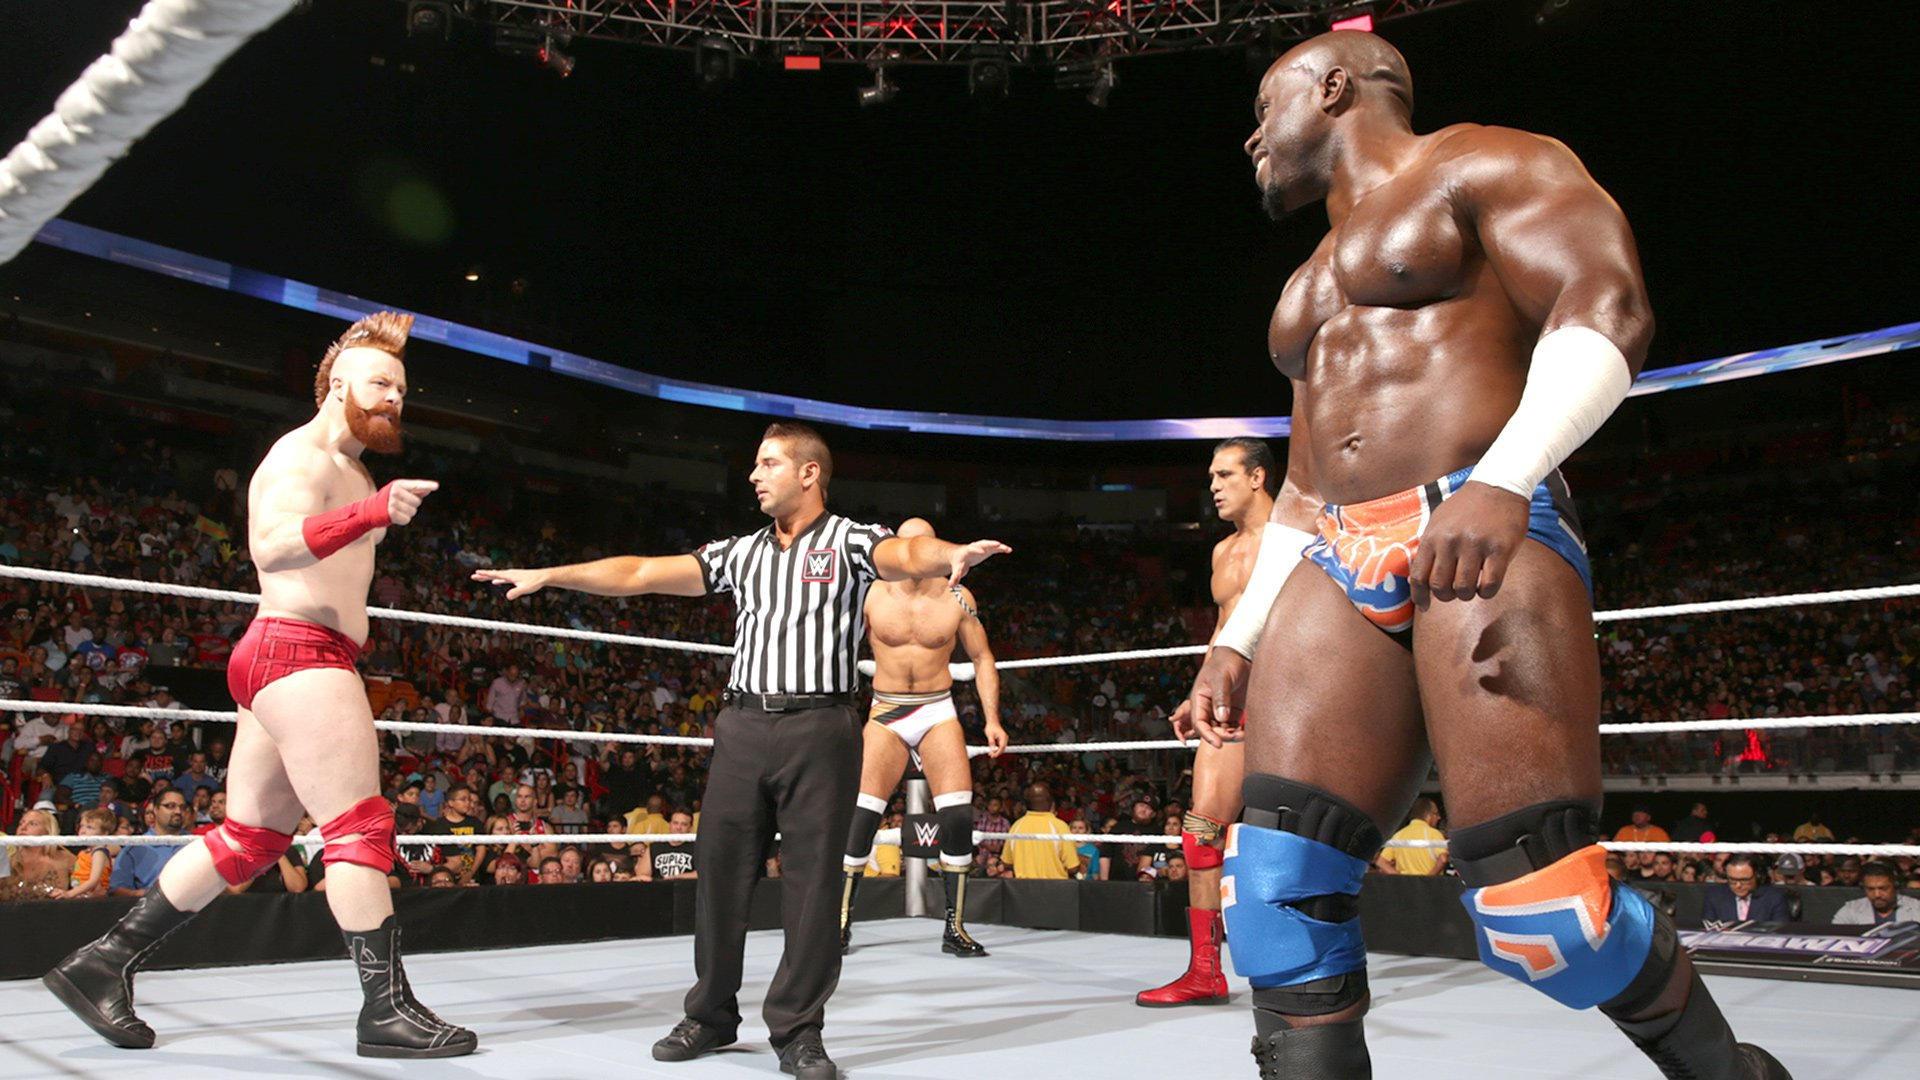 Resultats WWE SmackDown 30 juin